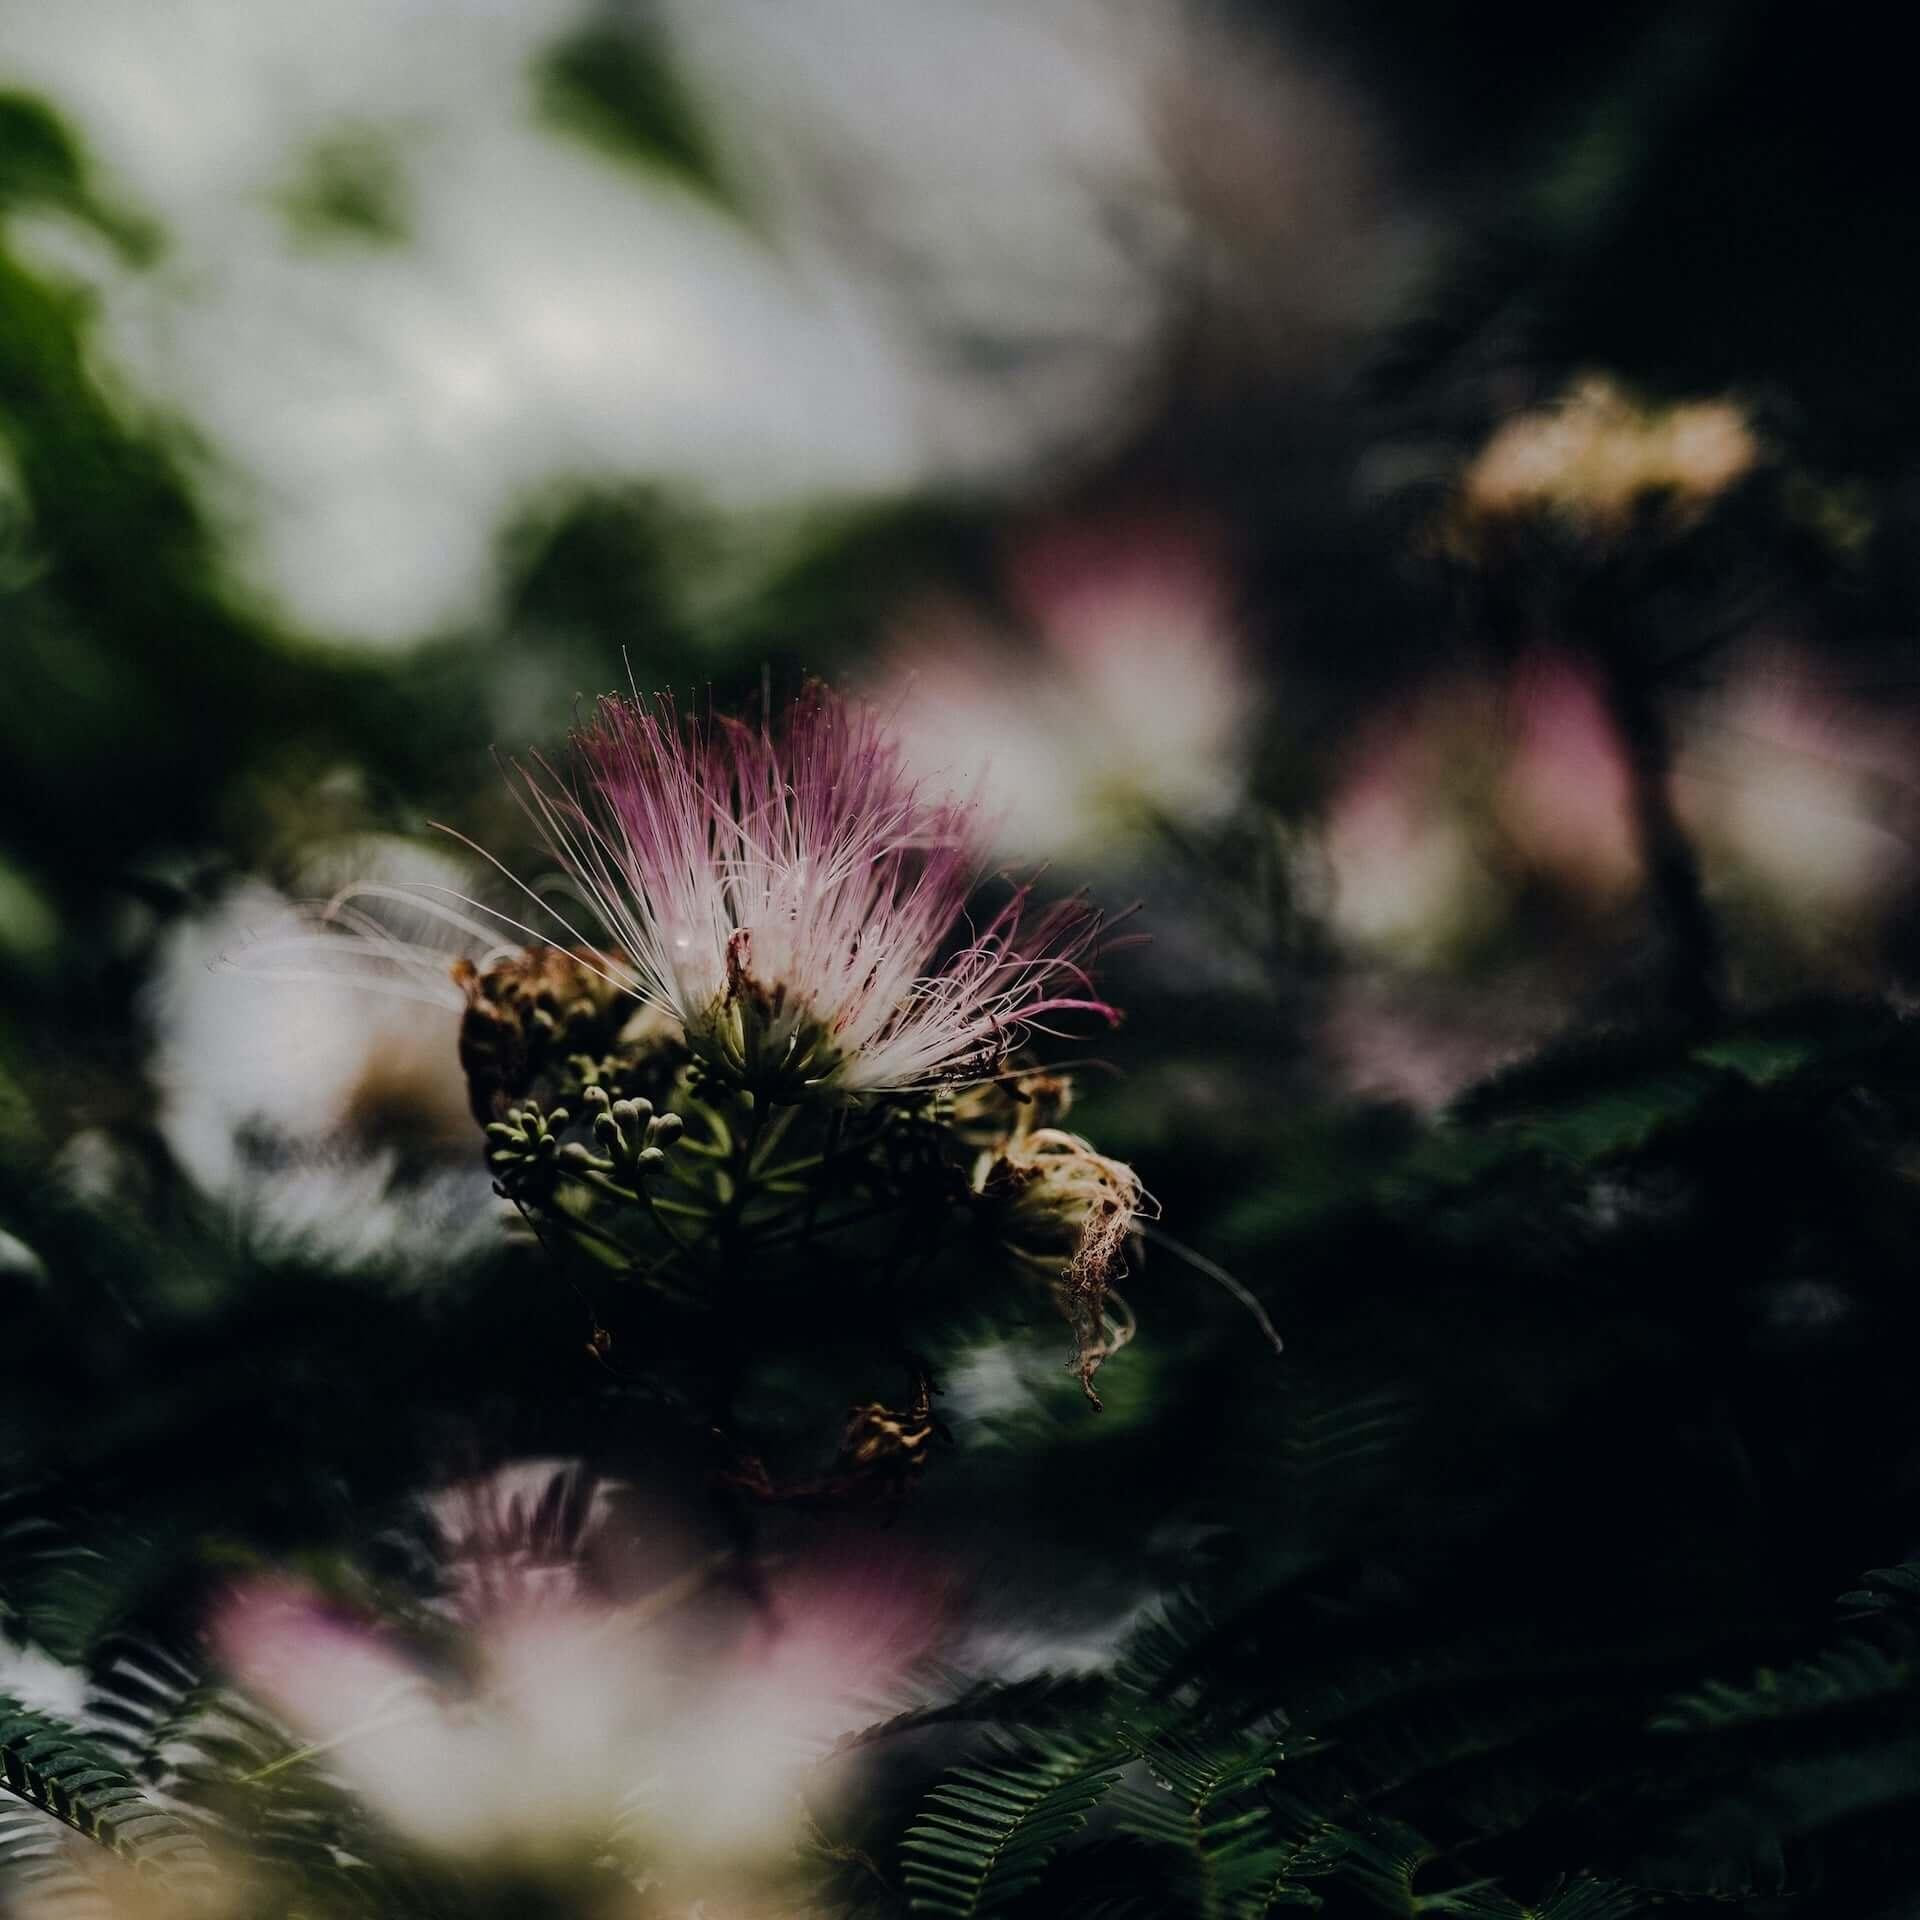 北里彰久 - In Bloom